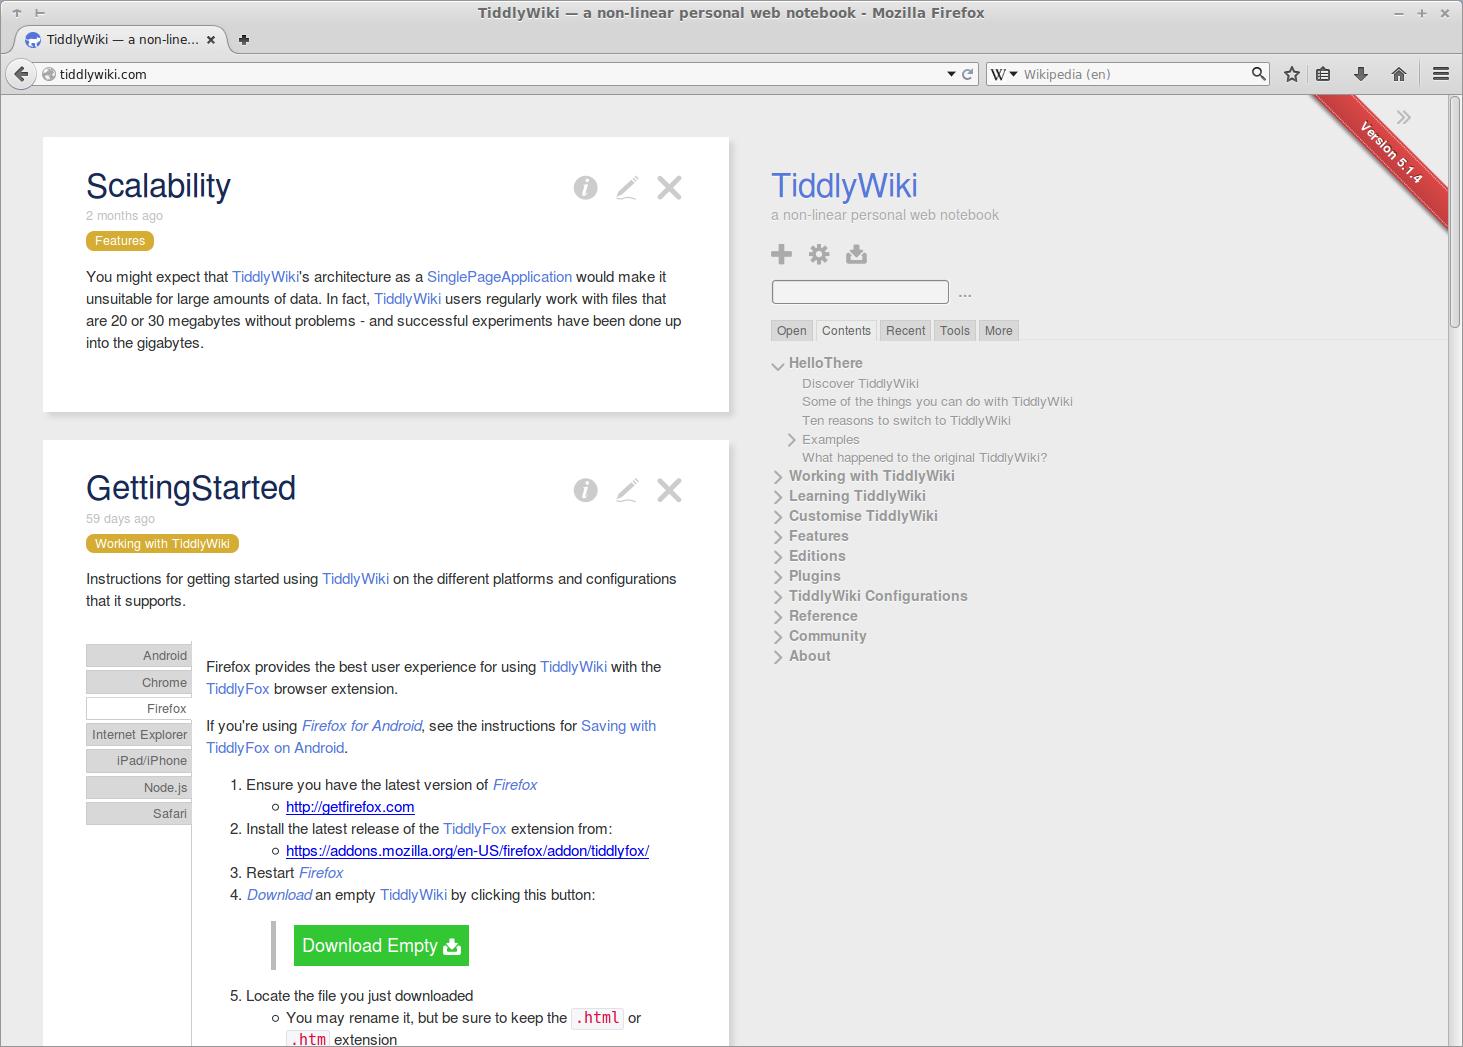 File:TiddlyWiki 5 1 4 screenshot png - Wikimedia Commons